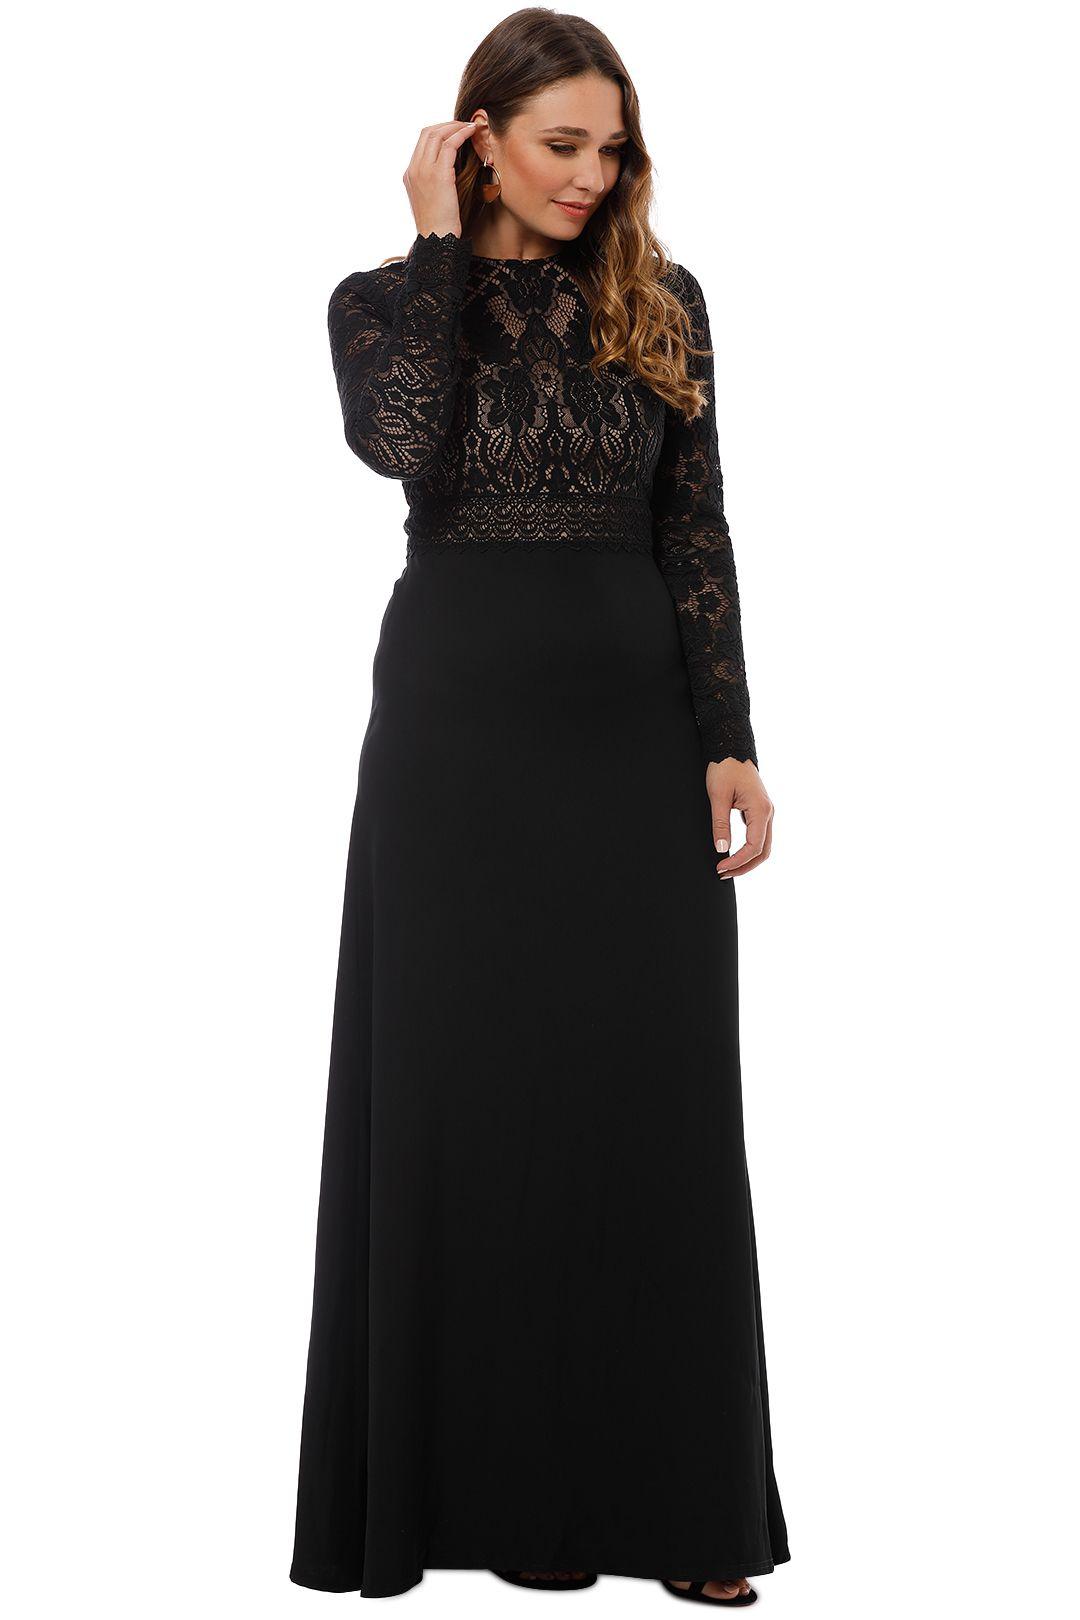 Tadashi Shoji - Benes Long Sleeve Gown - Black - Side